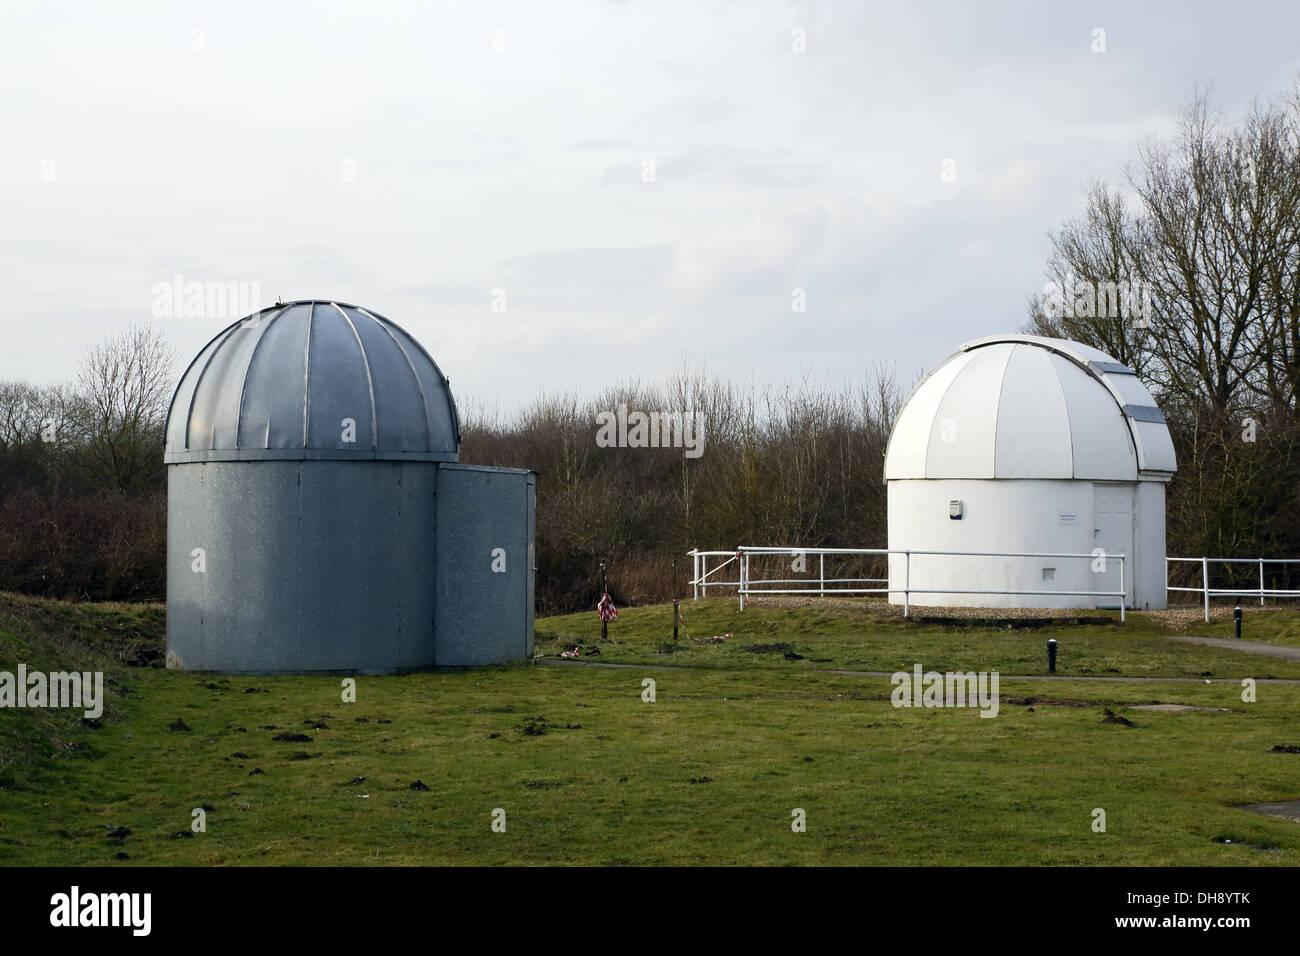 Amateur astronomy society — img 2